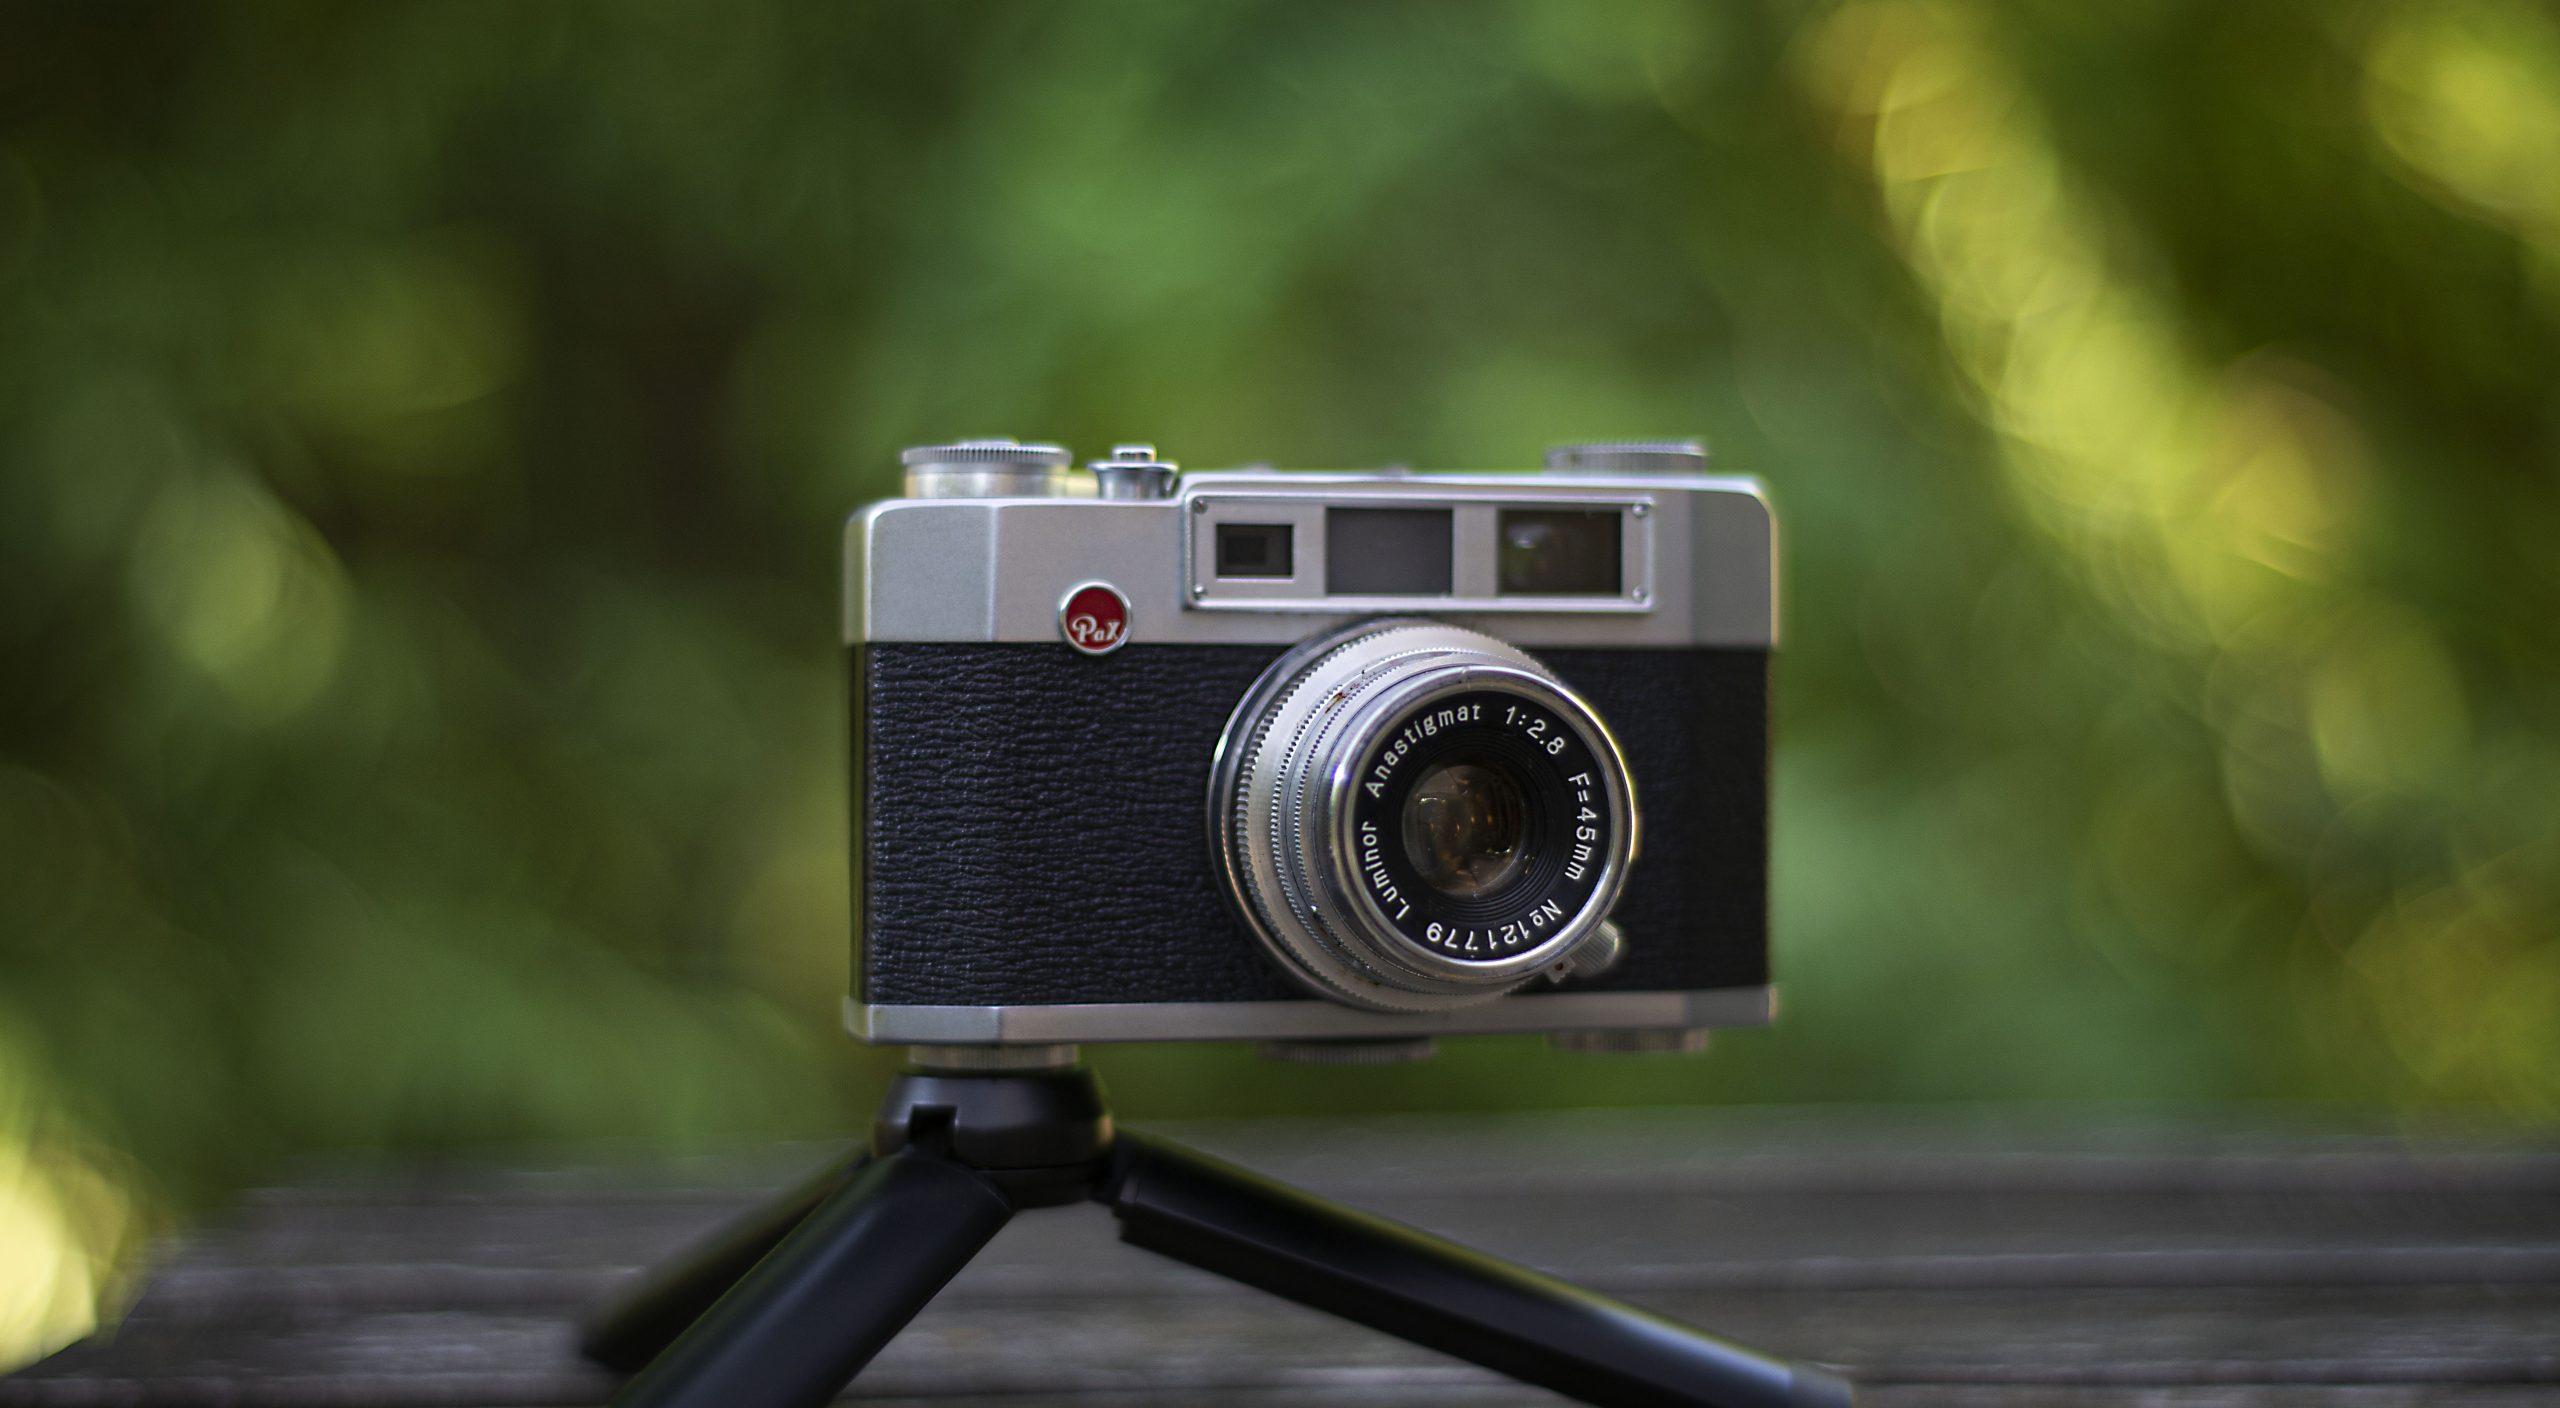 Pax M4 35mm film camera